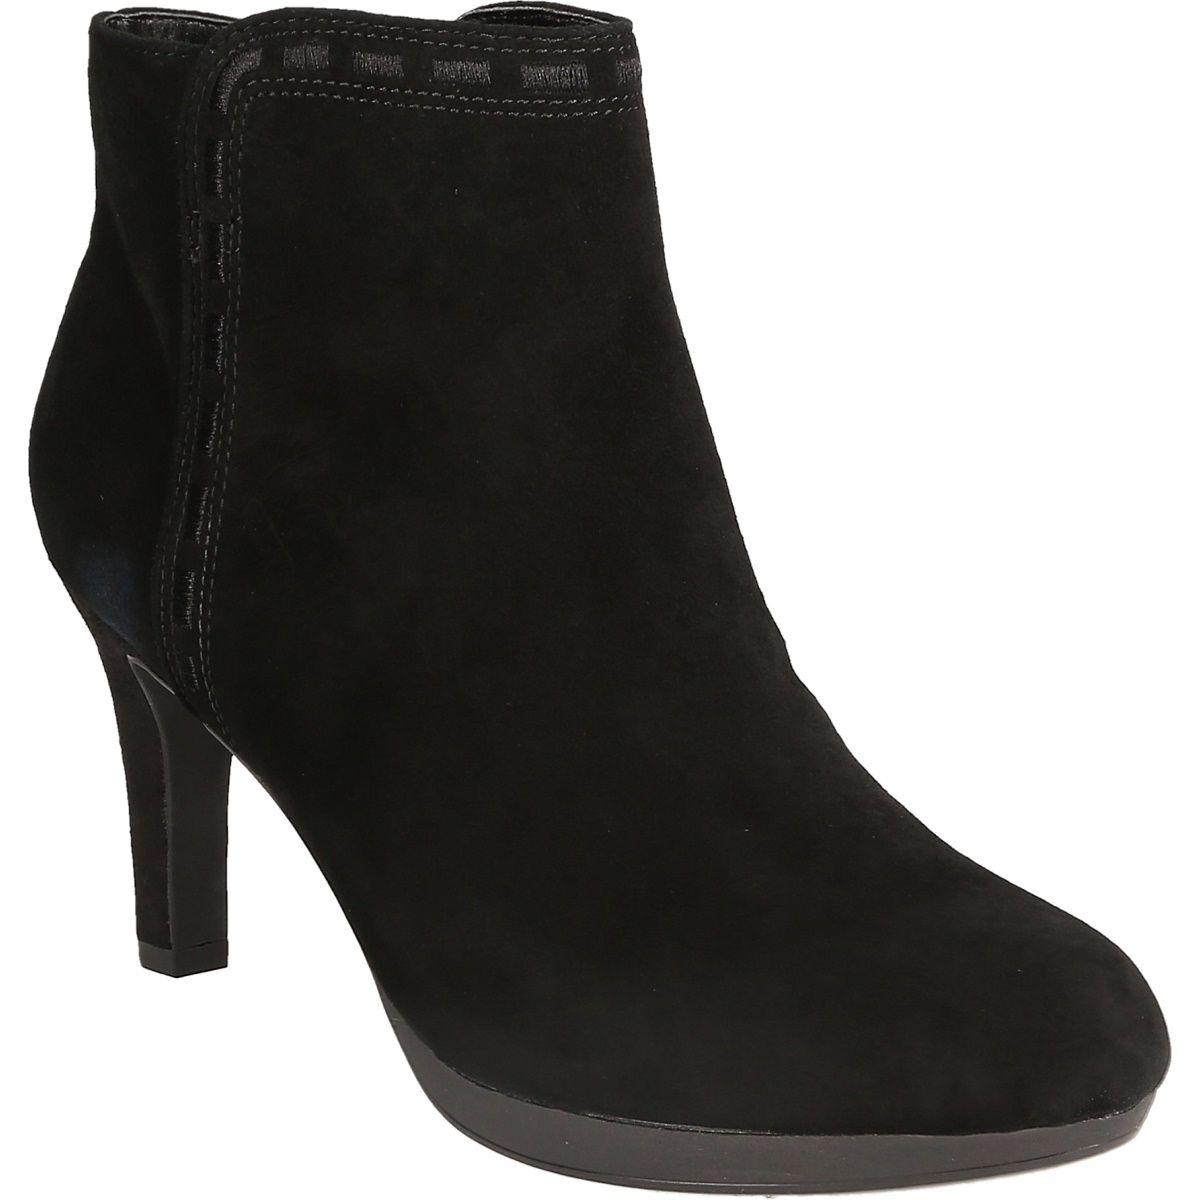 4 Sadie Clarks Shoes Adriel Women's Half Buy 26129358 Boots 76yYbfg